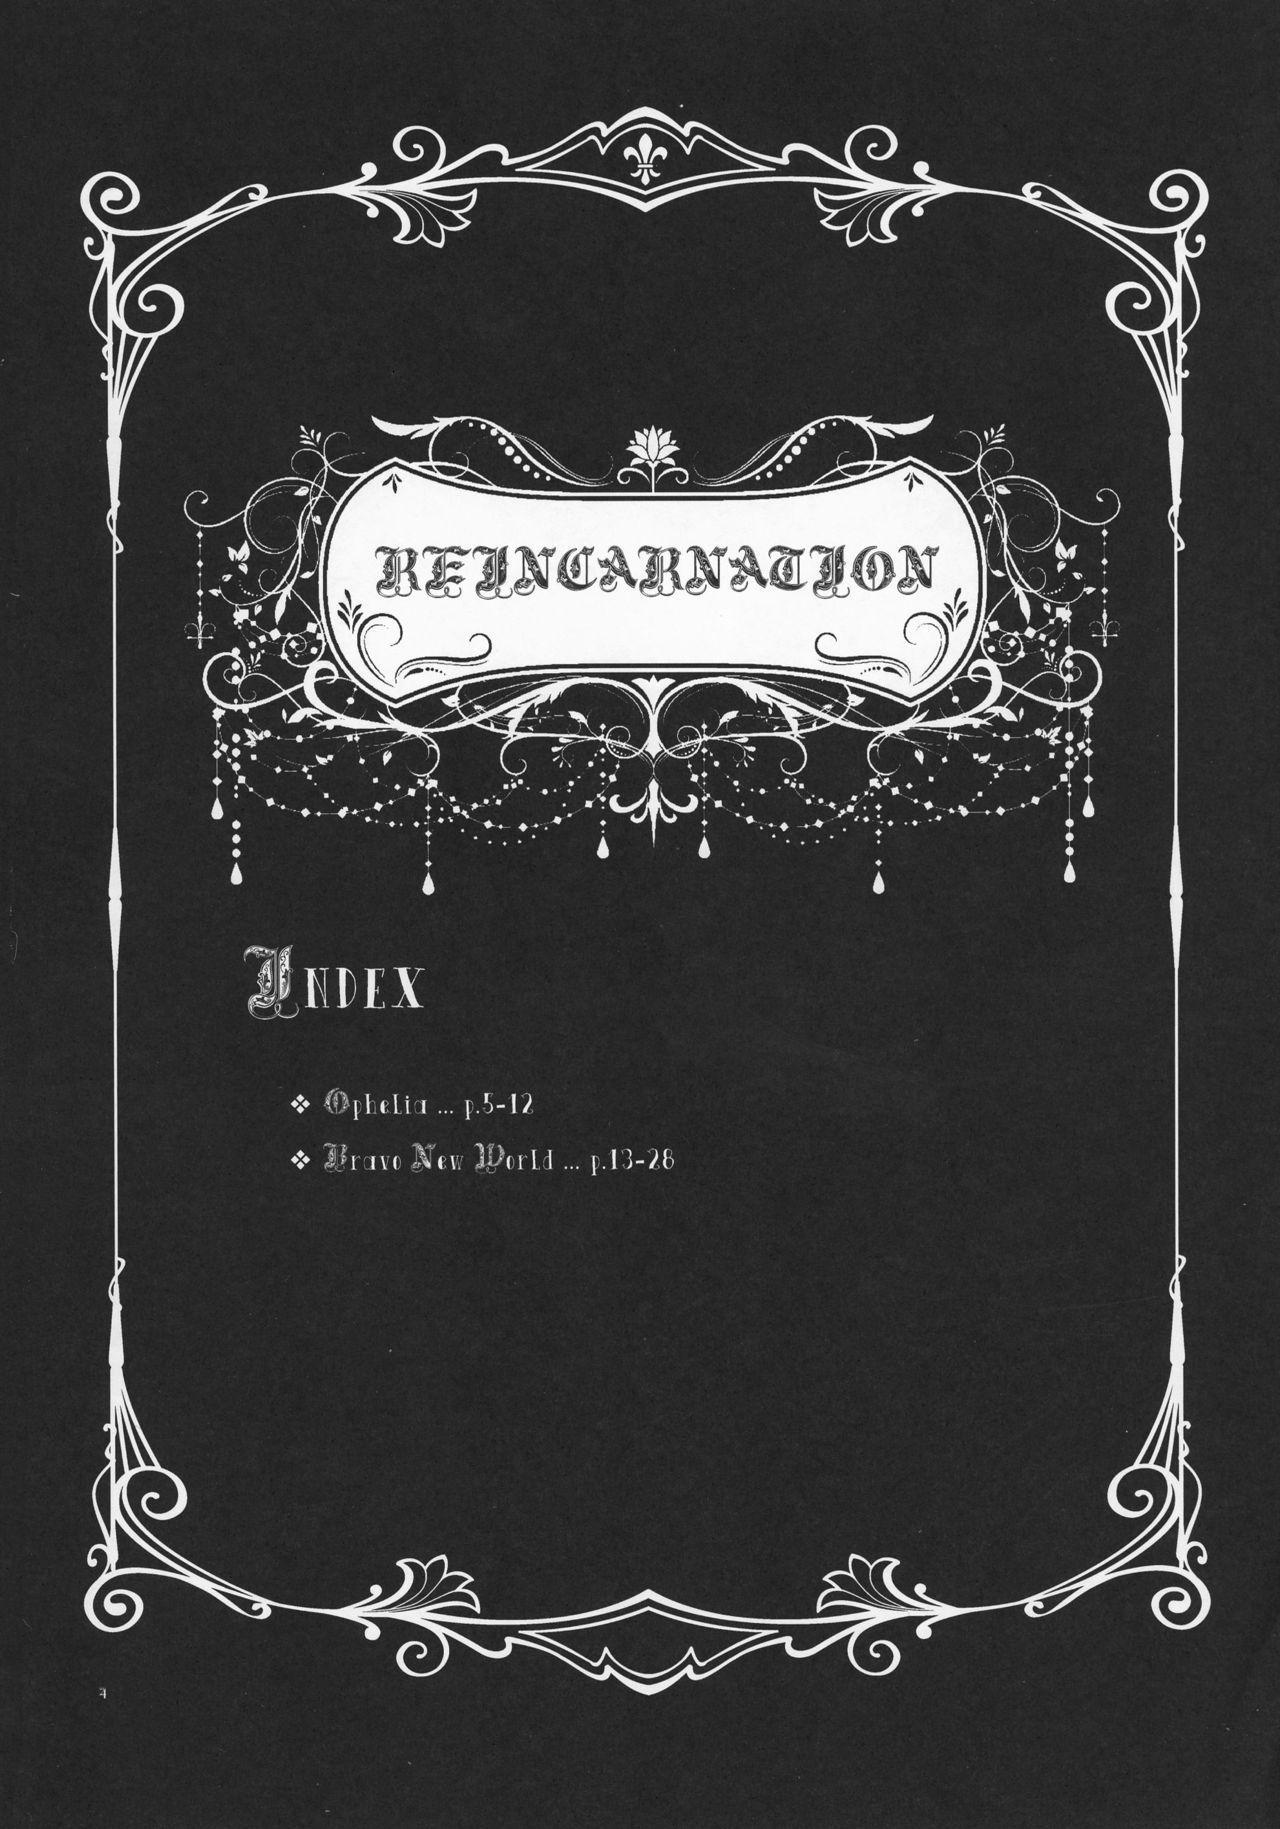 RE- Incarnation 3